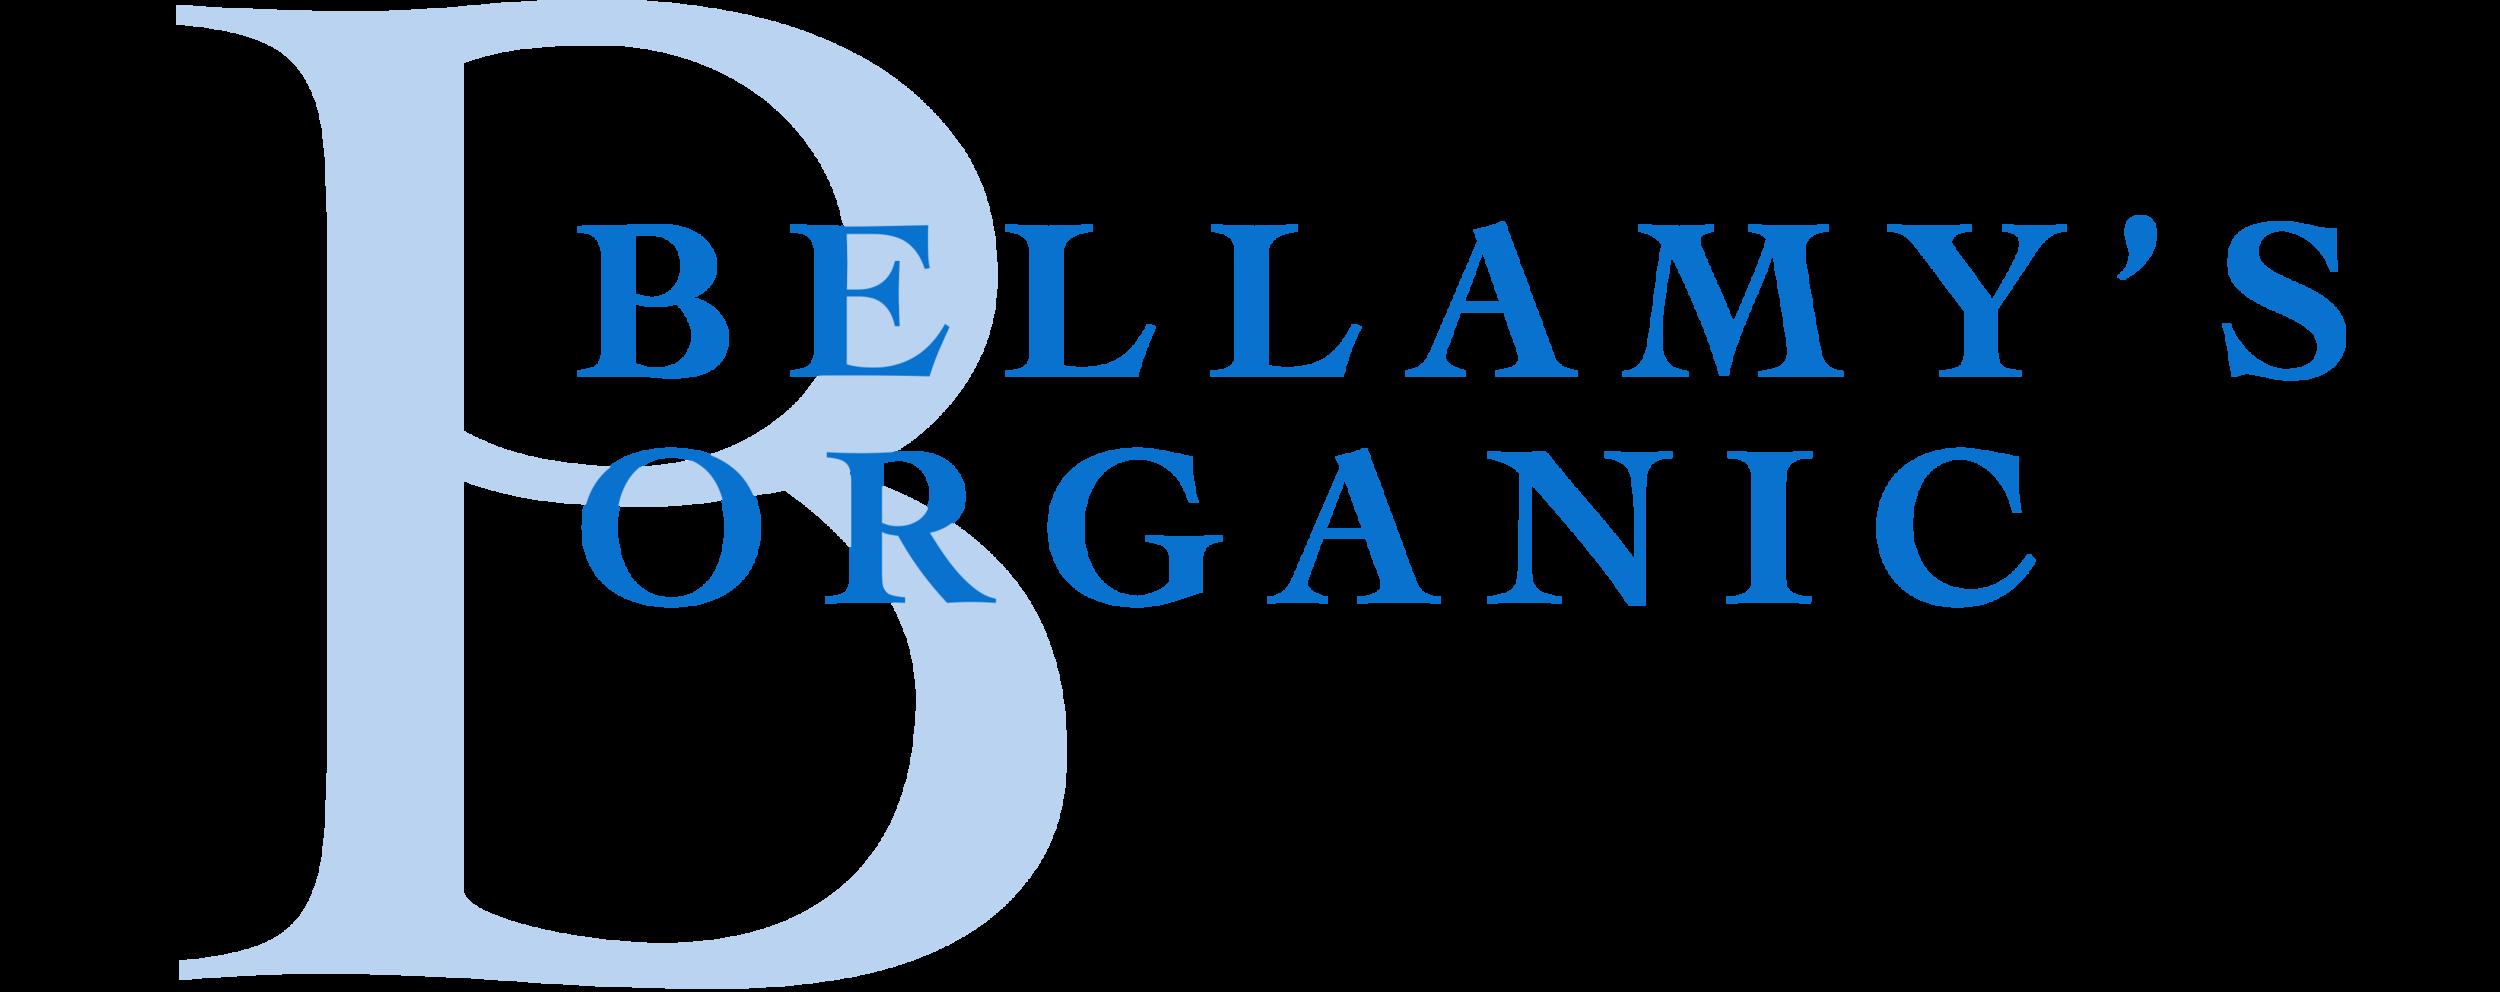 Bellamys-logo.png